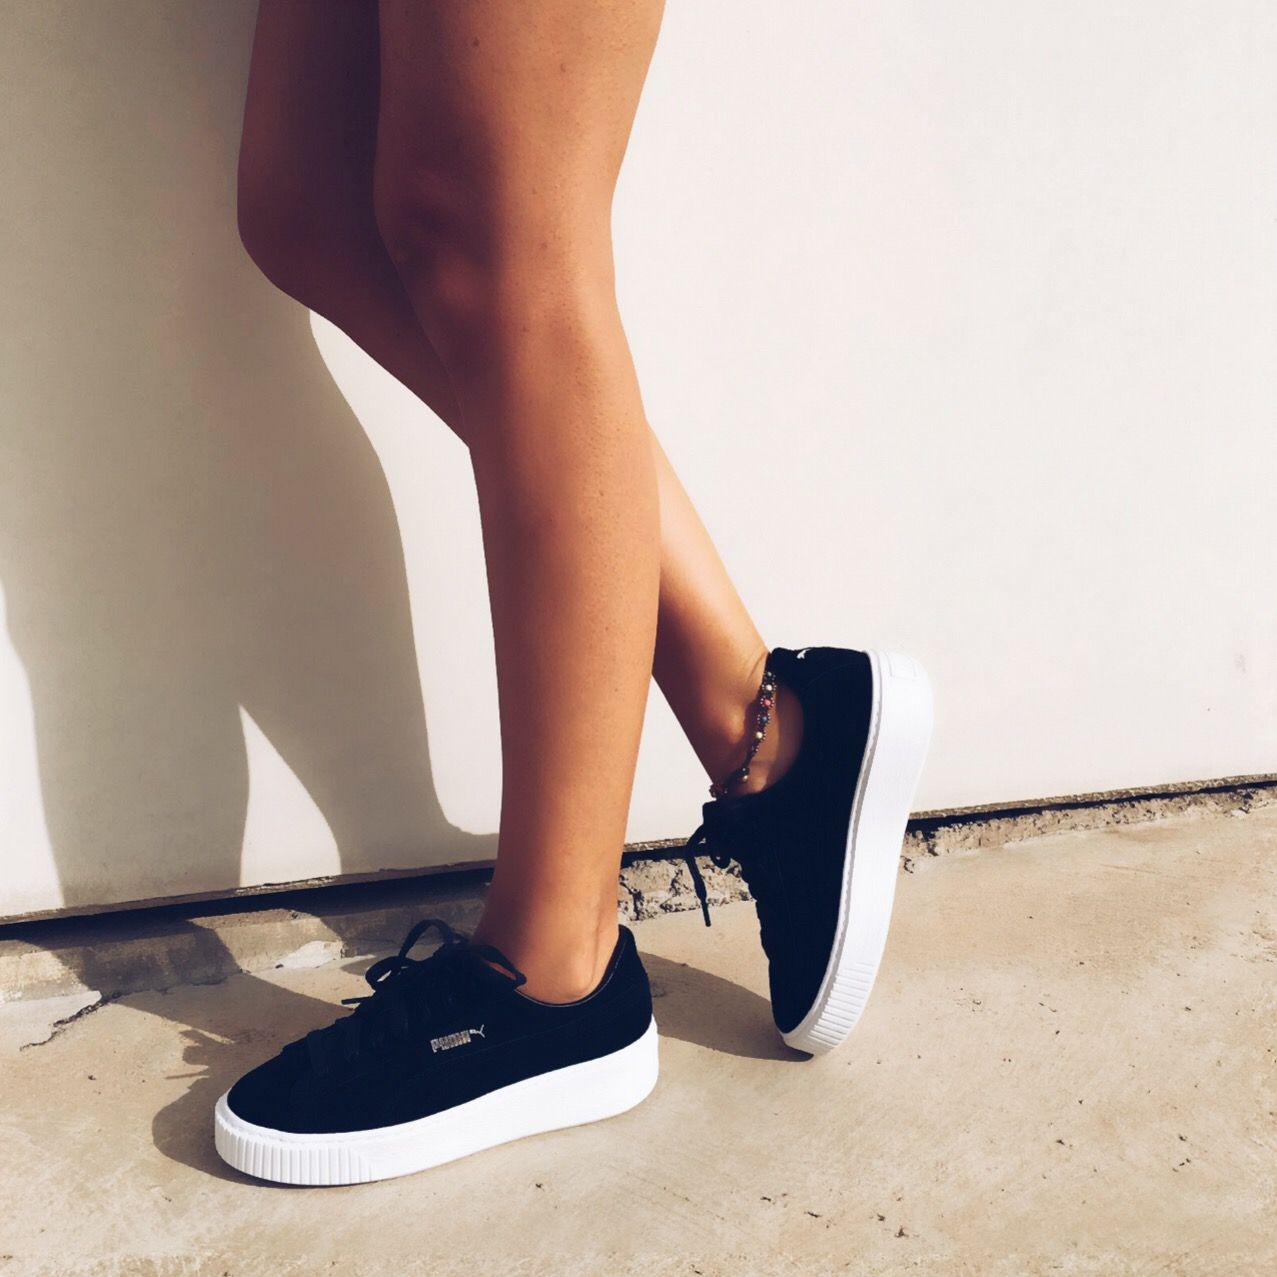 b4ddb35e Creepers serraje negro PUMA | Síguenos en Instagram | Zapatos puma ...